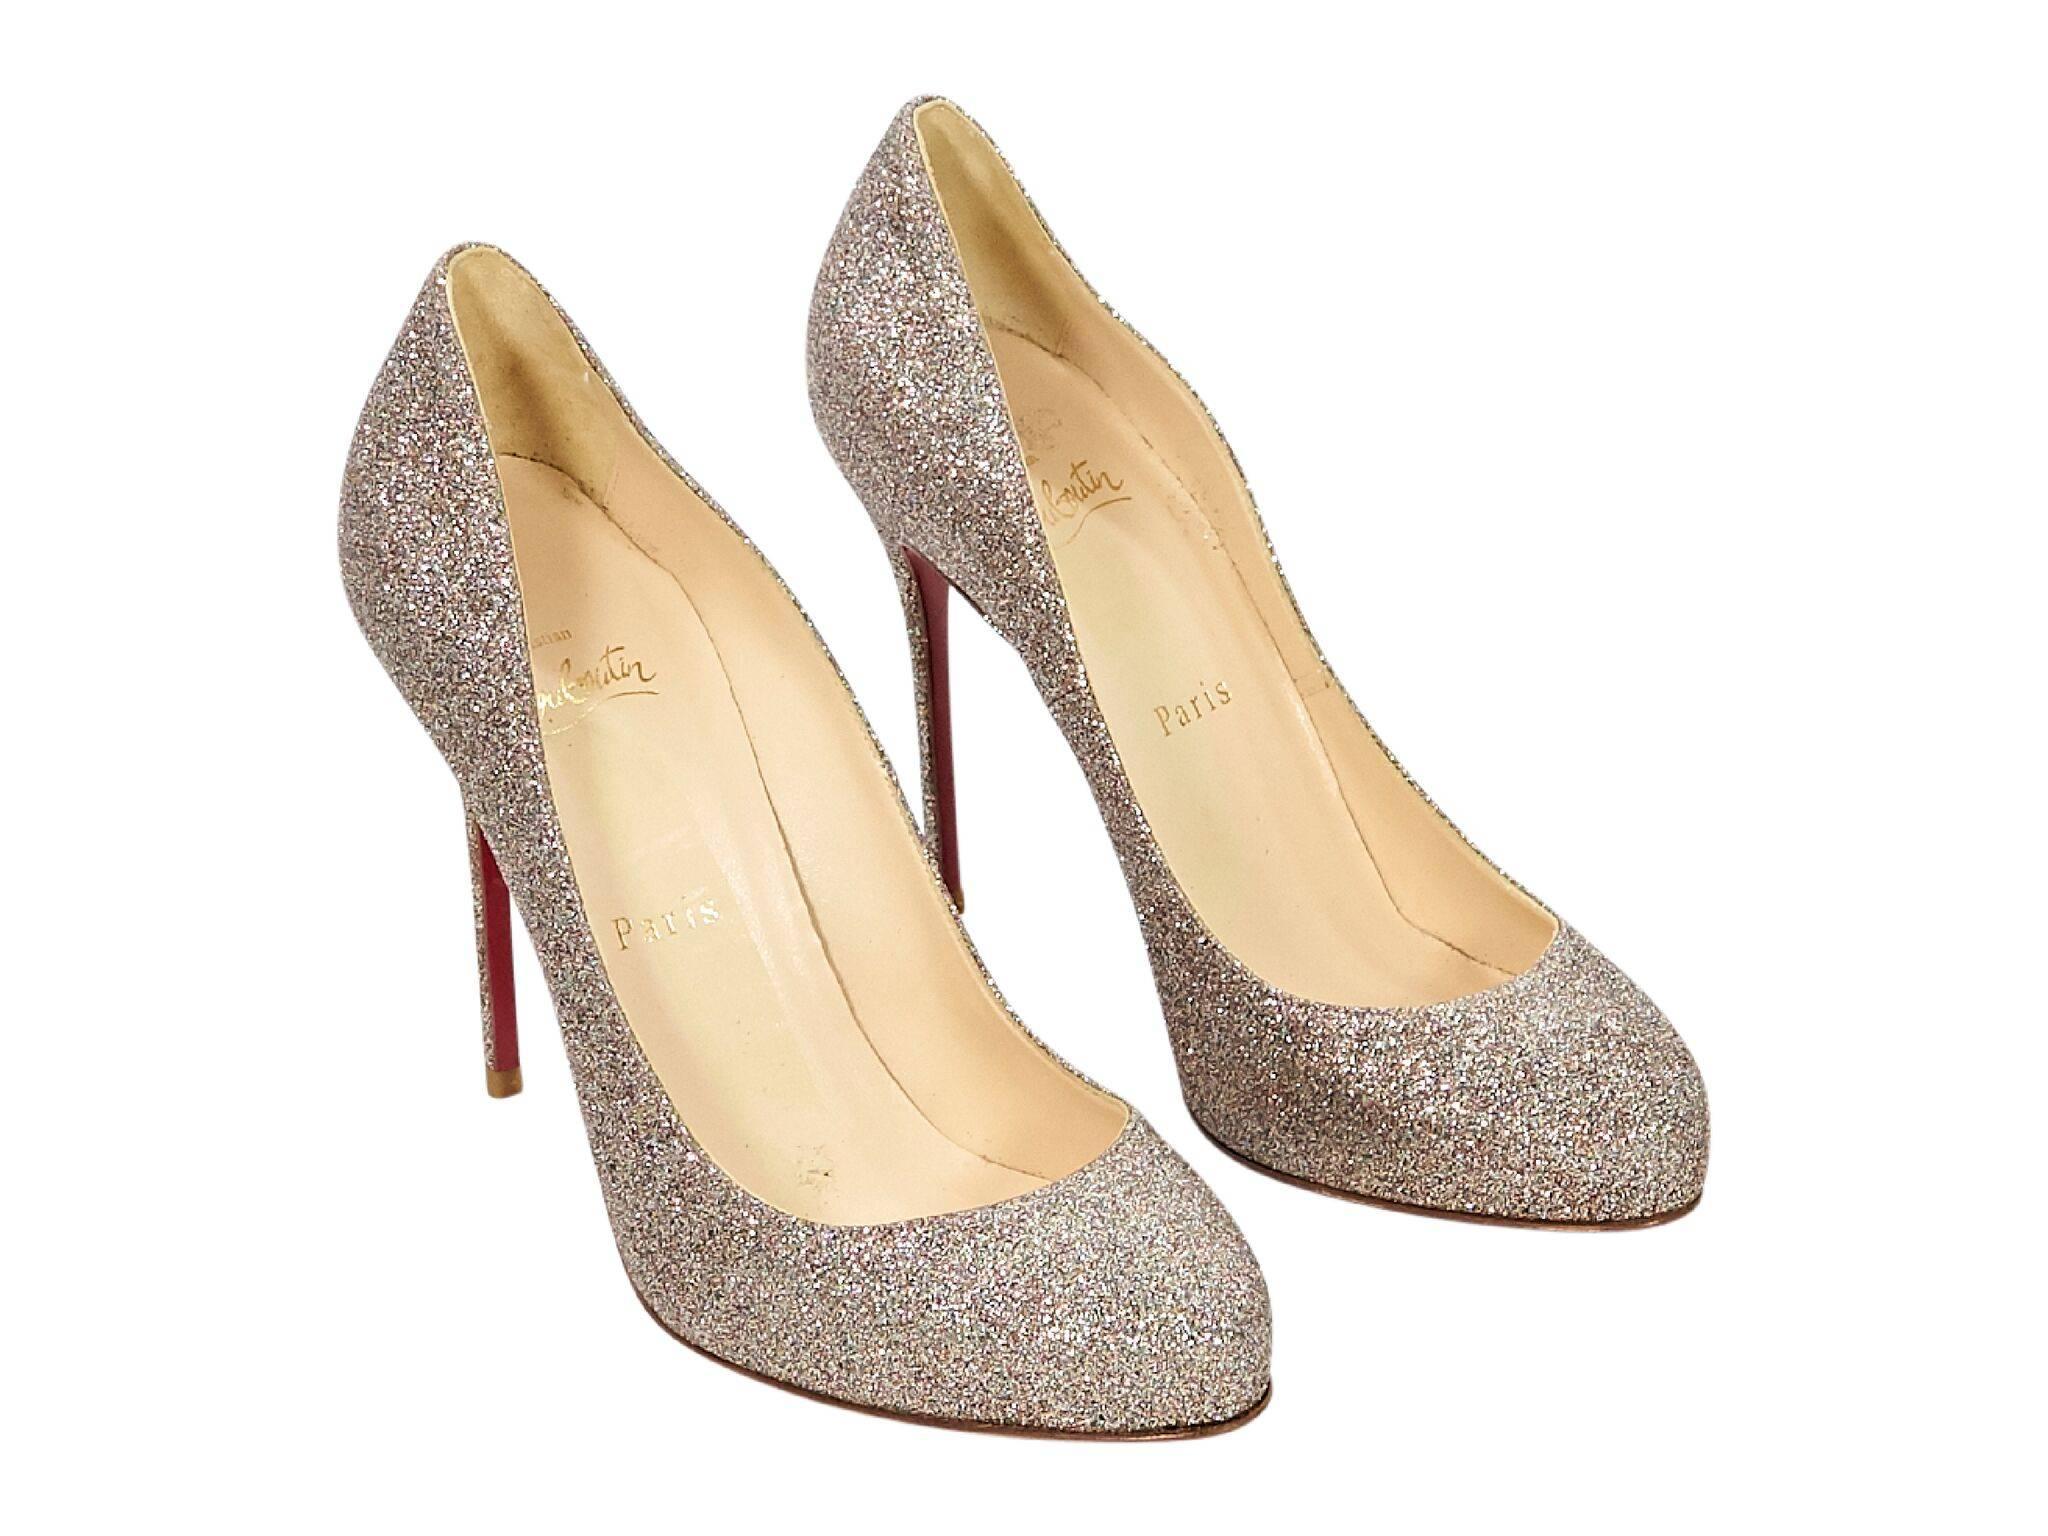 Cheap Christian Louboutin Shoes Ireland